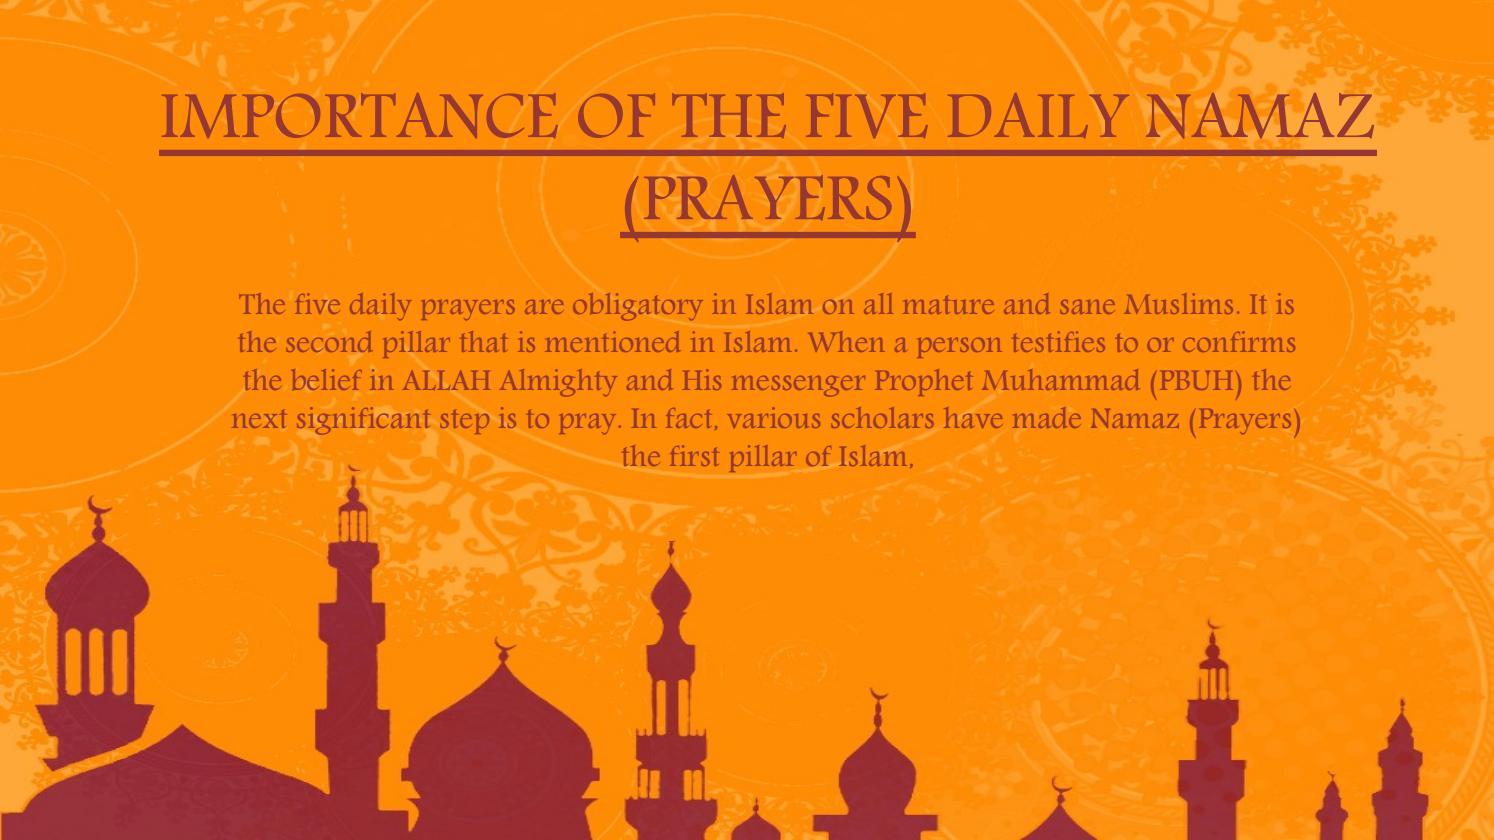 Importance Of The Five Daily Namaz (prayers) by Saudi Tours